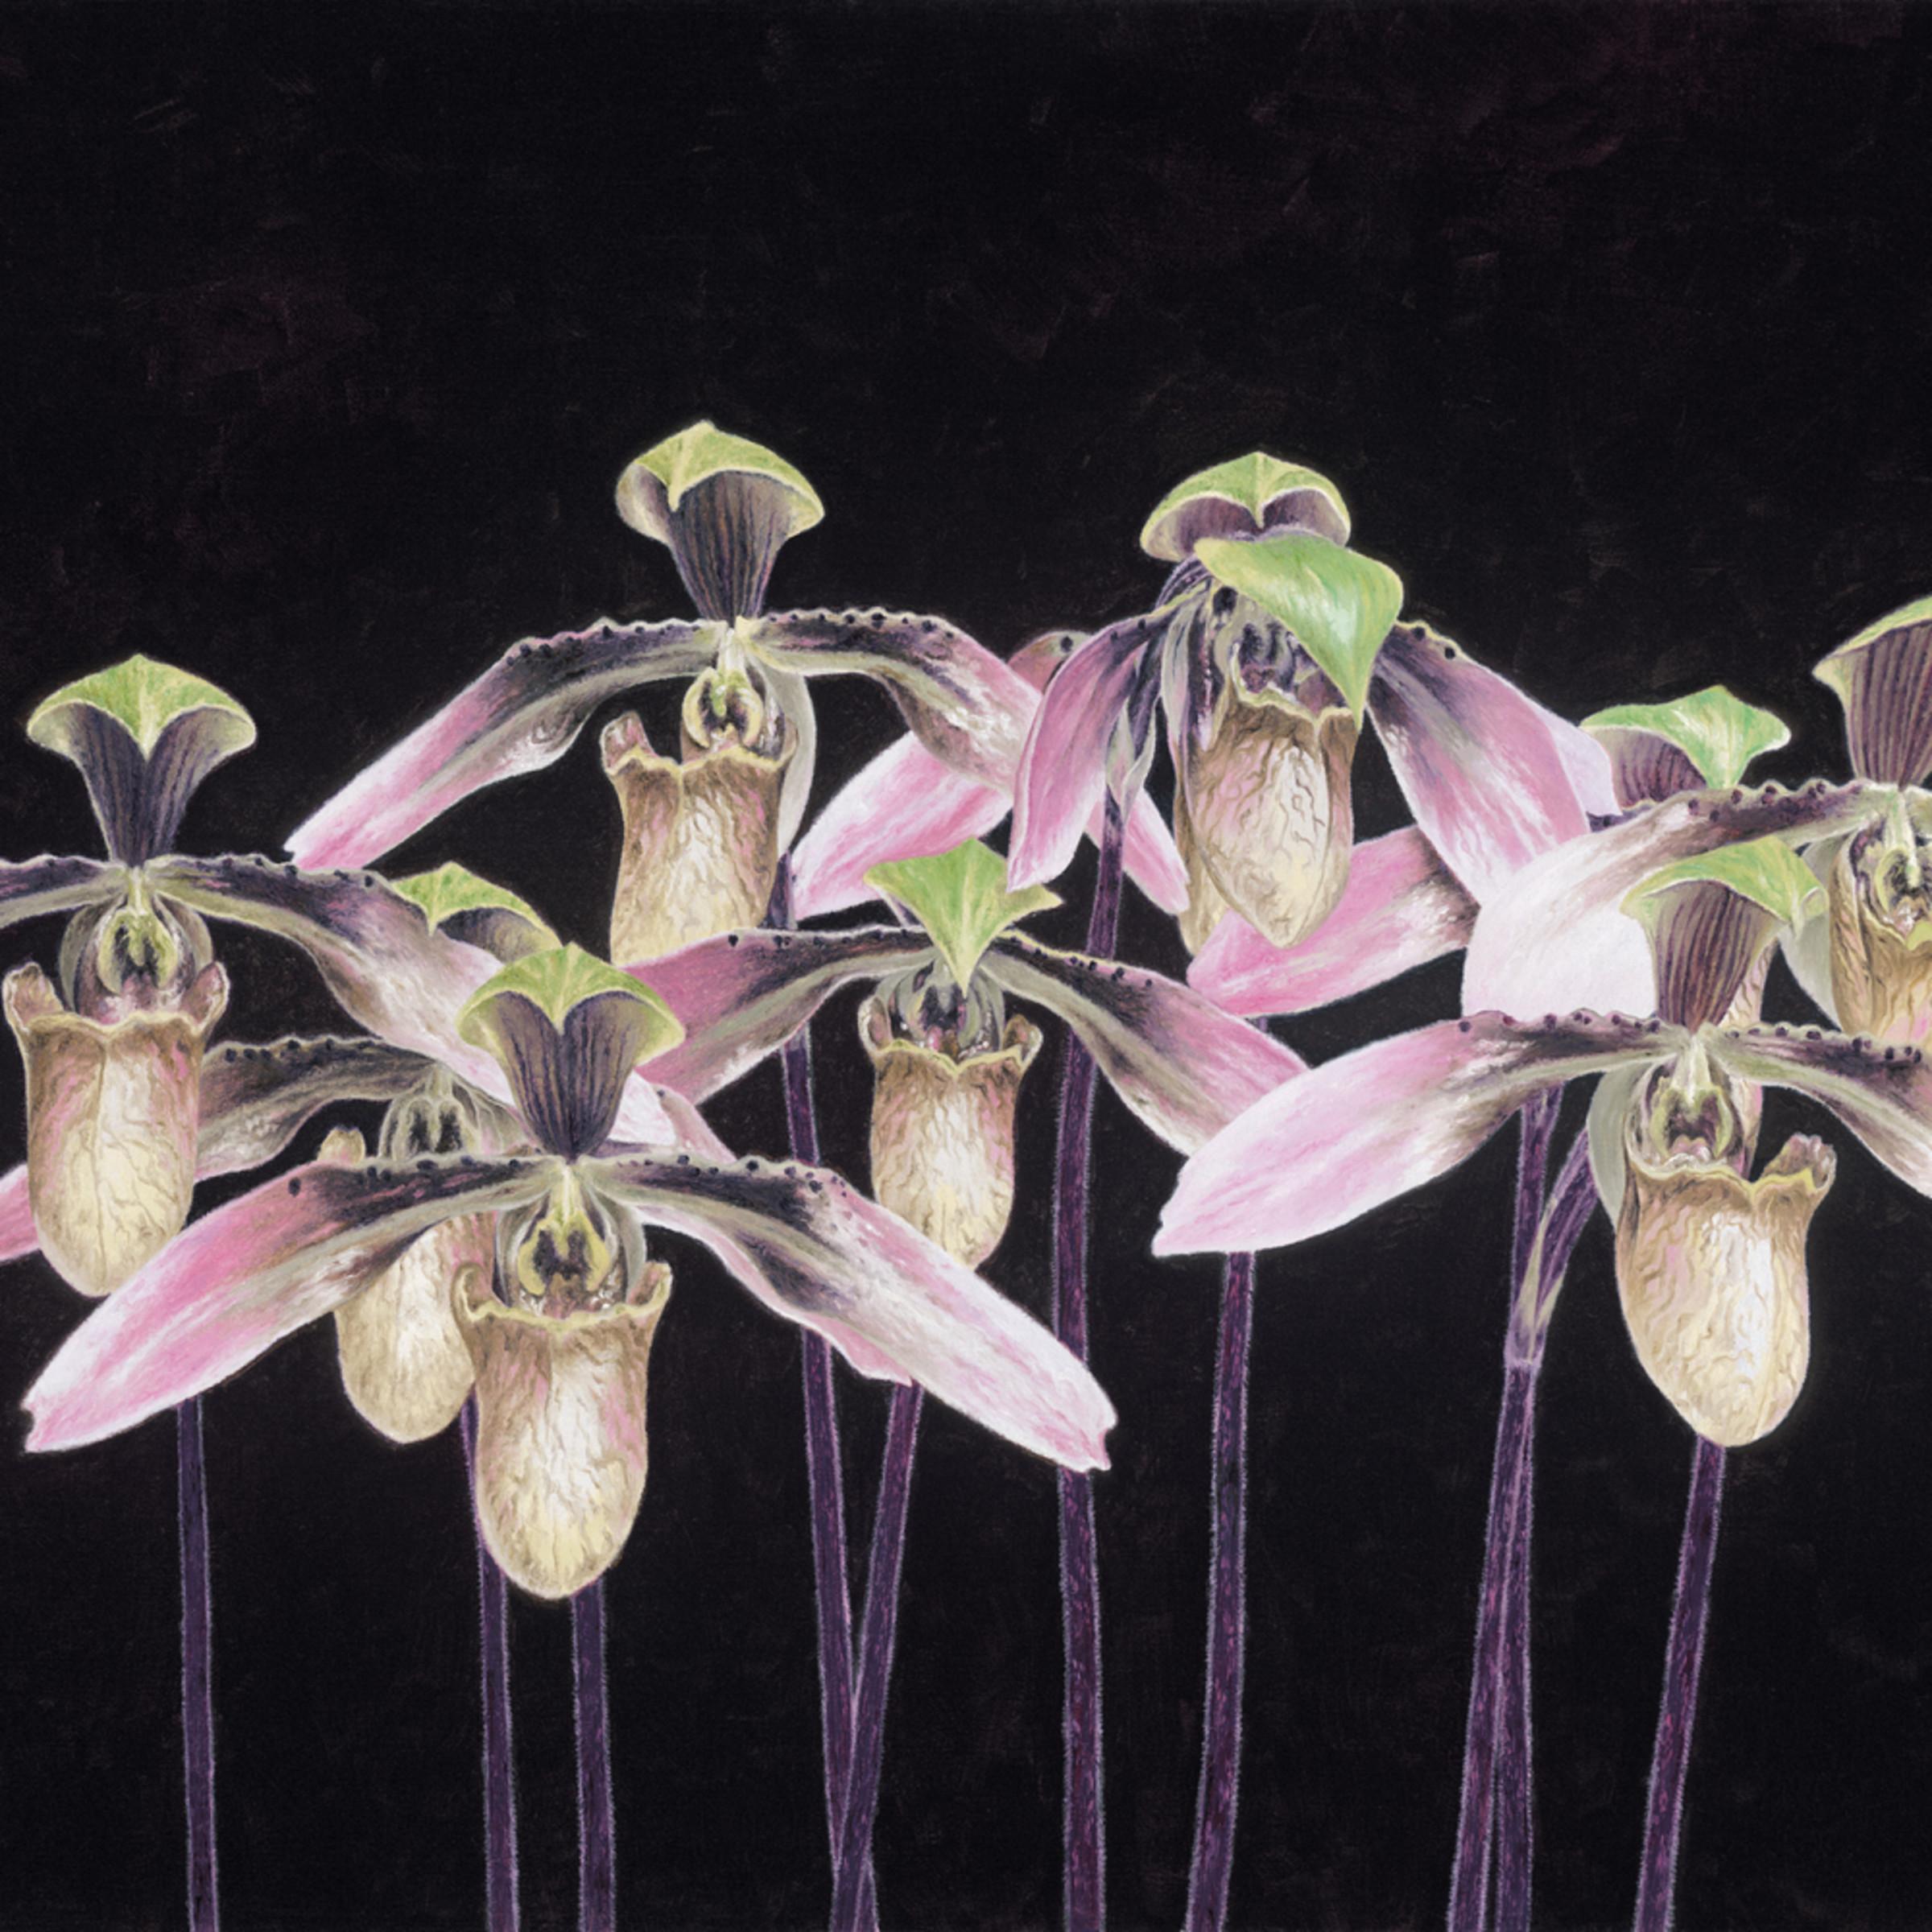 Orchids.rgb ypdgnx